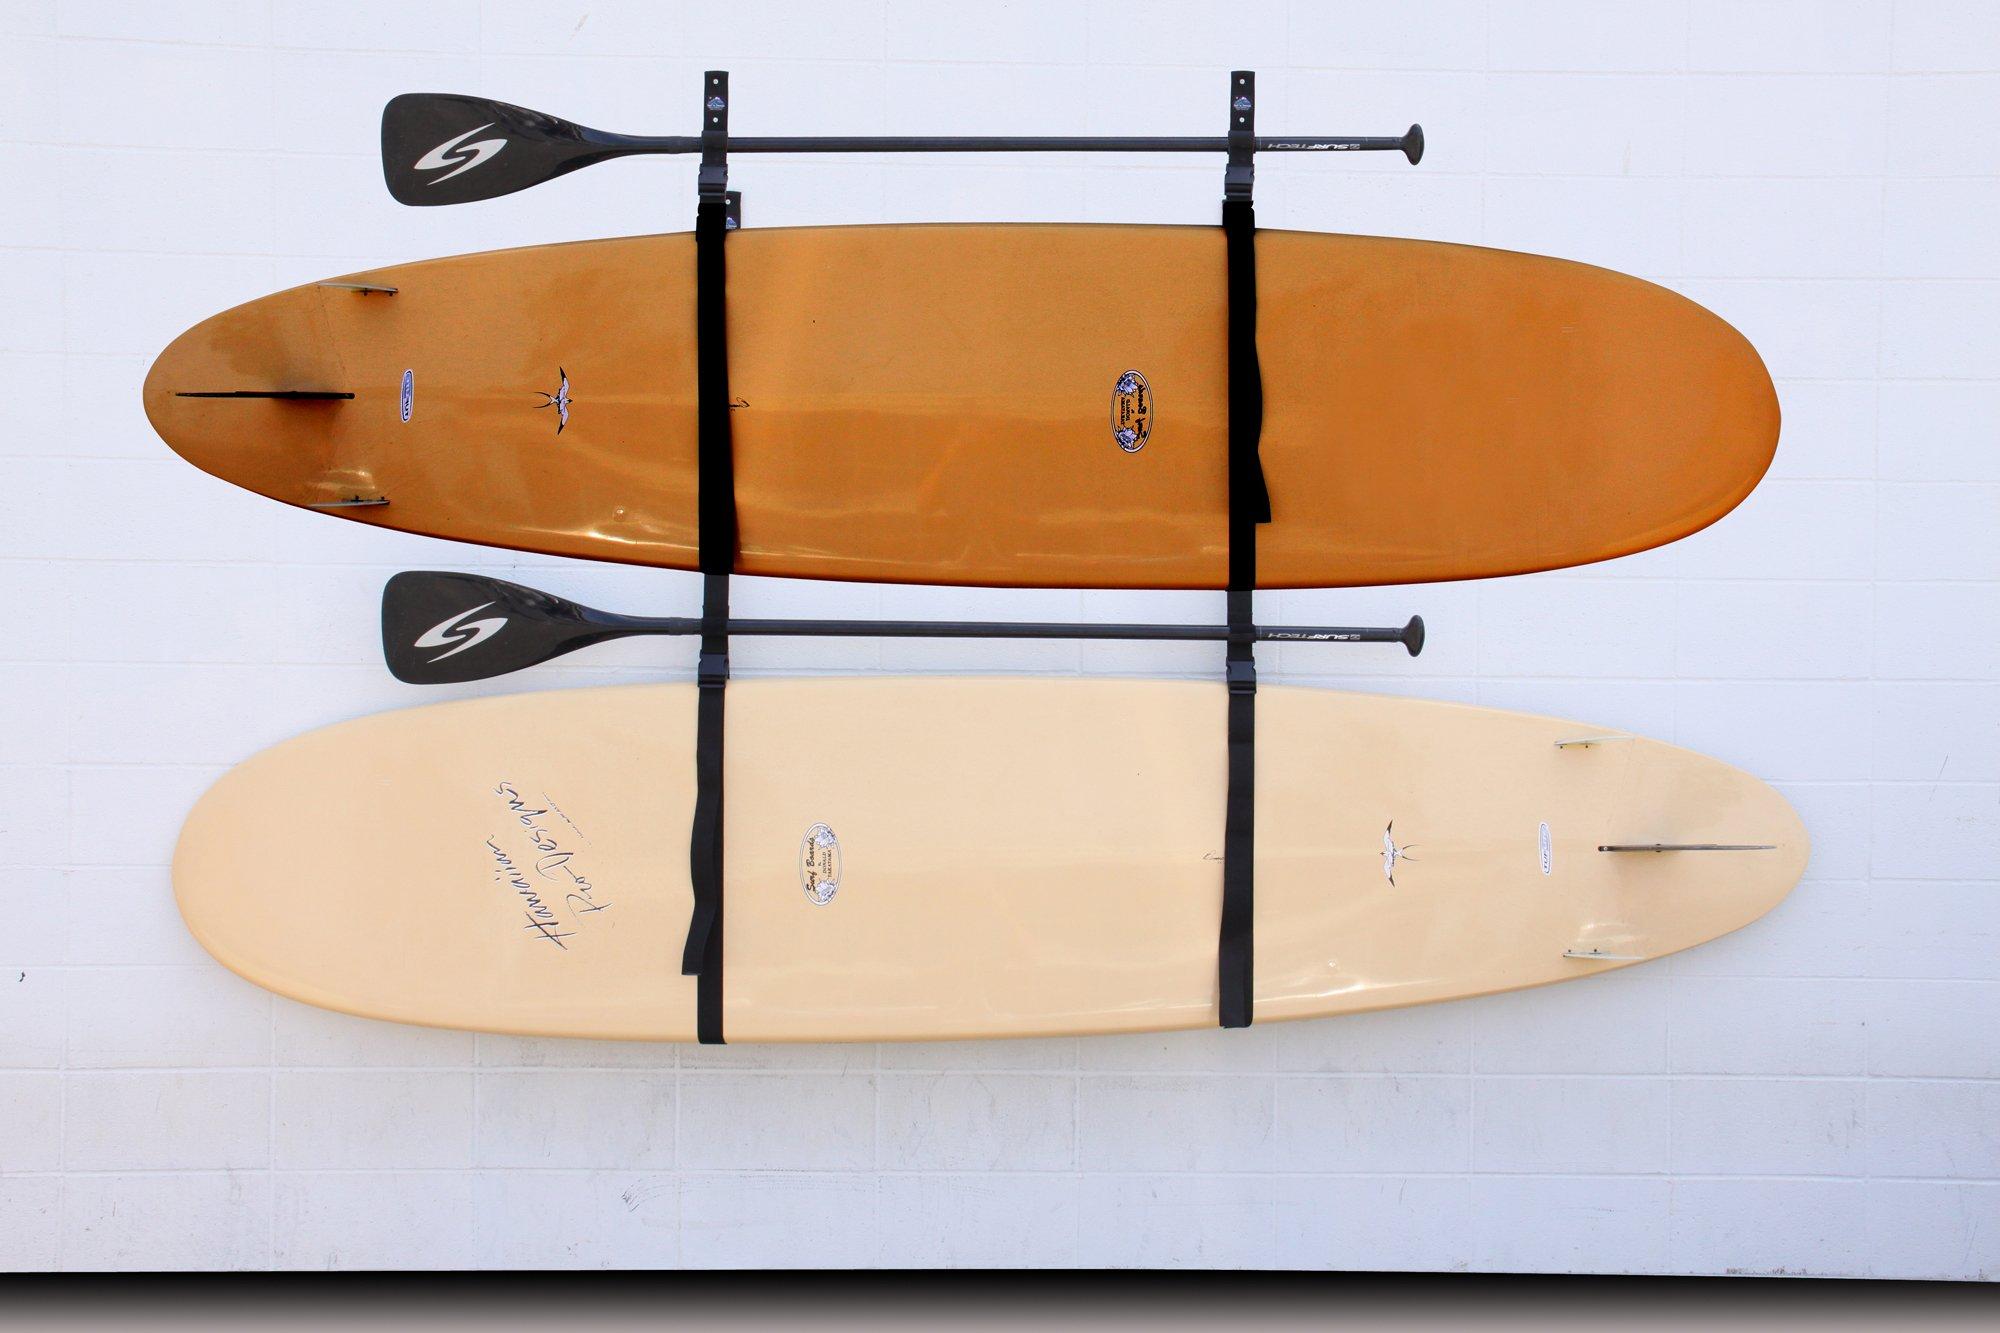 Webbing Boat Hanger Strap - Set of 2, kayak wall hanger, SUP wall hanger, kayak hanger, canoe hanger, surfboard hanger, garage hanger, kayak wall rack hanger adjustable by Surf To Summit